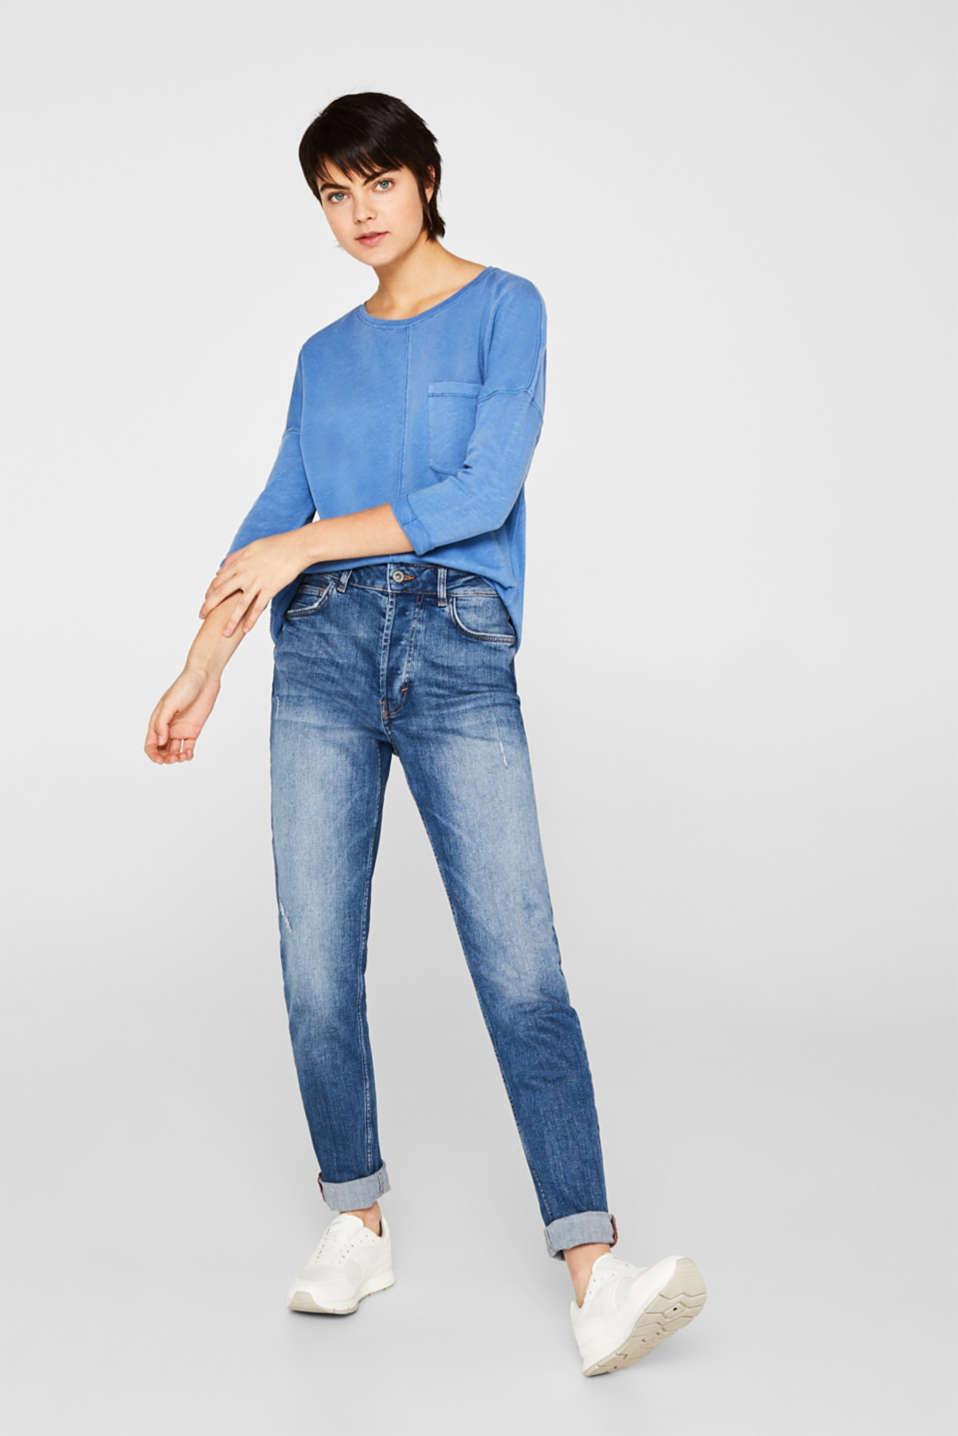 NEON slub T-shirt with a pocket, 100% cotton, BRIGHT BLUE, detail image number 1